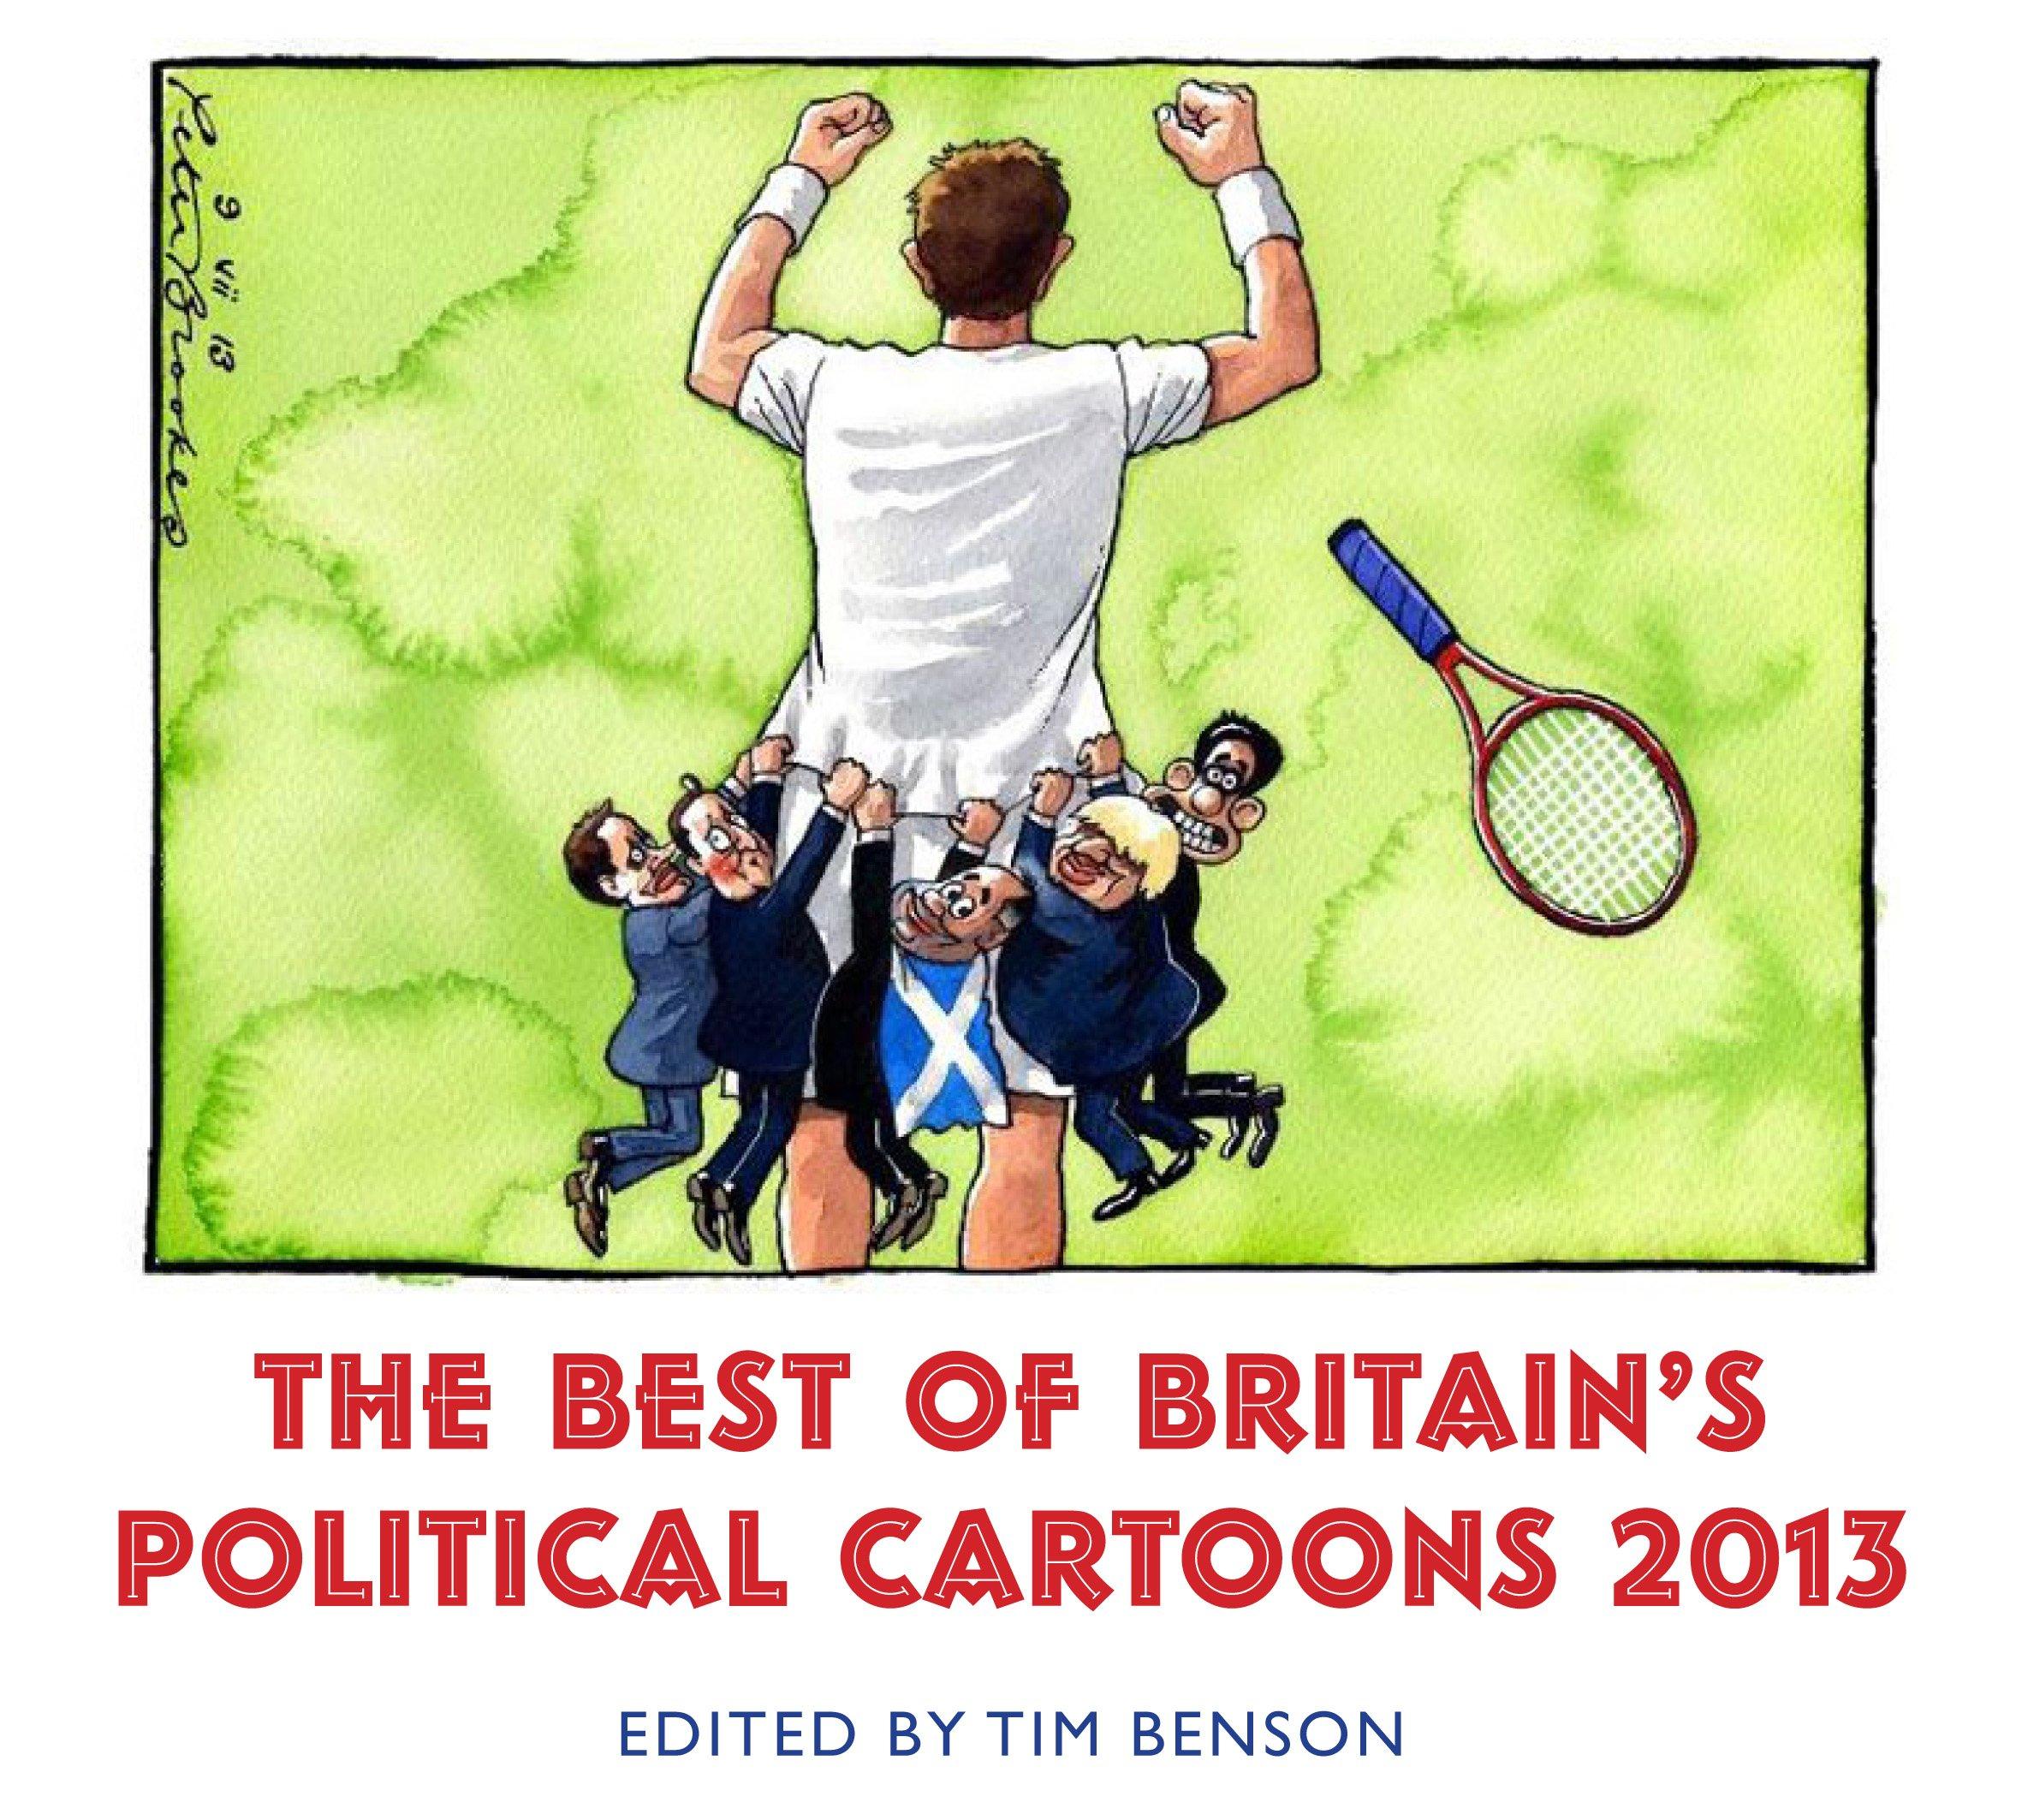 Political Cartoons 15 Widescreen